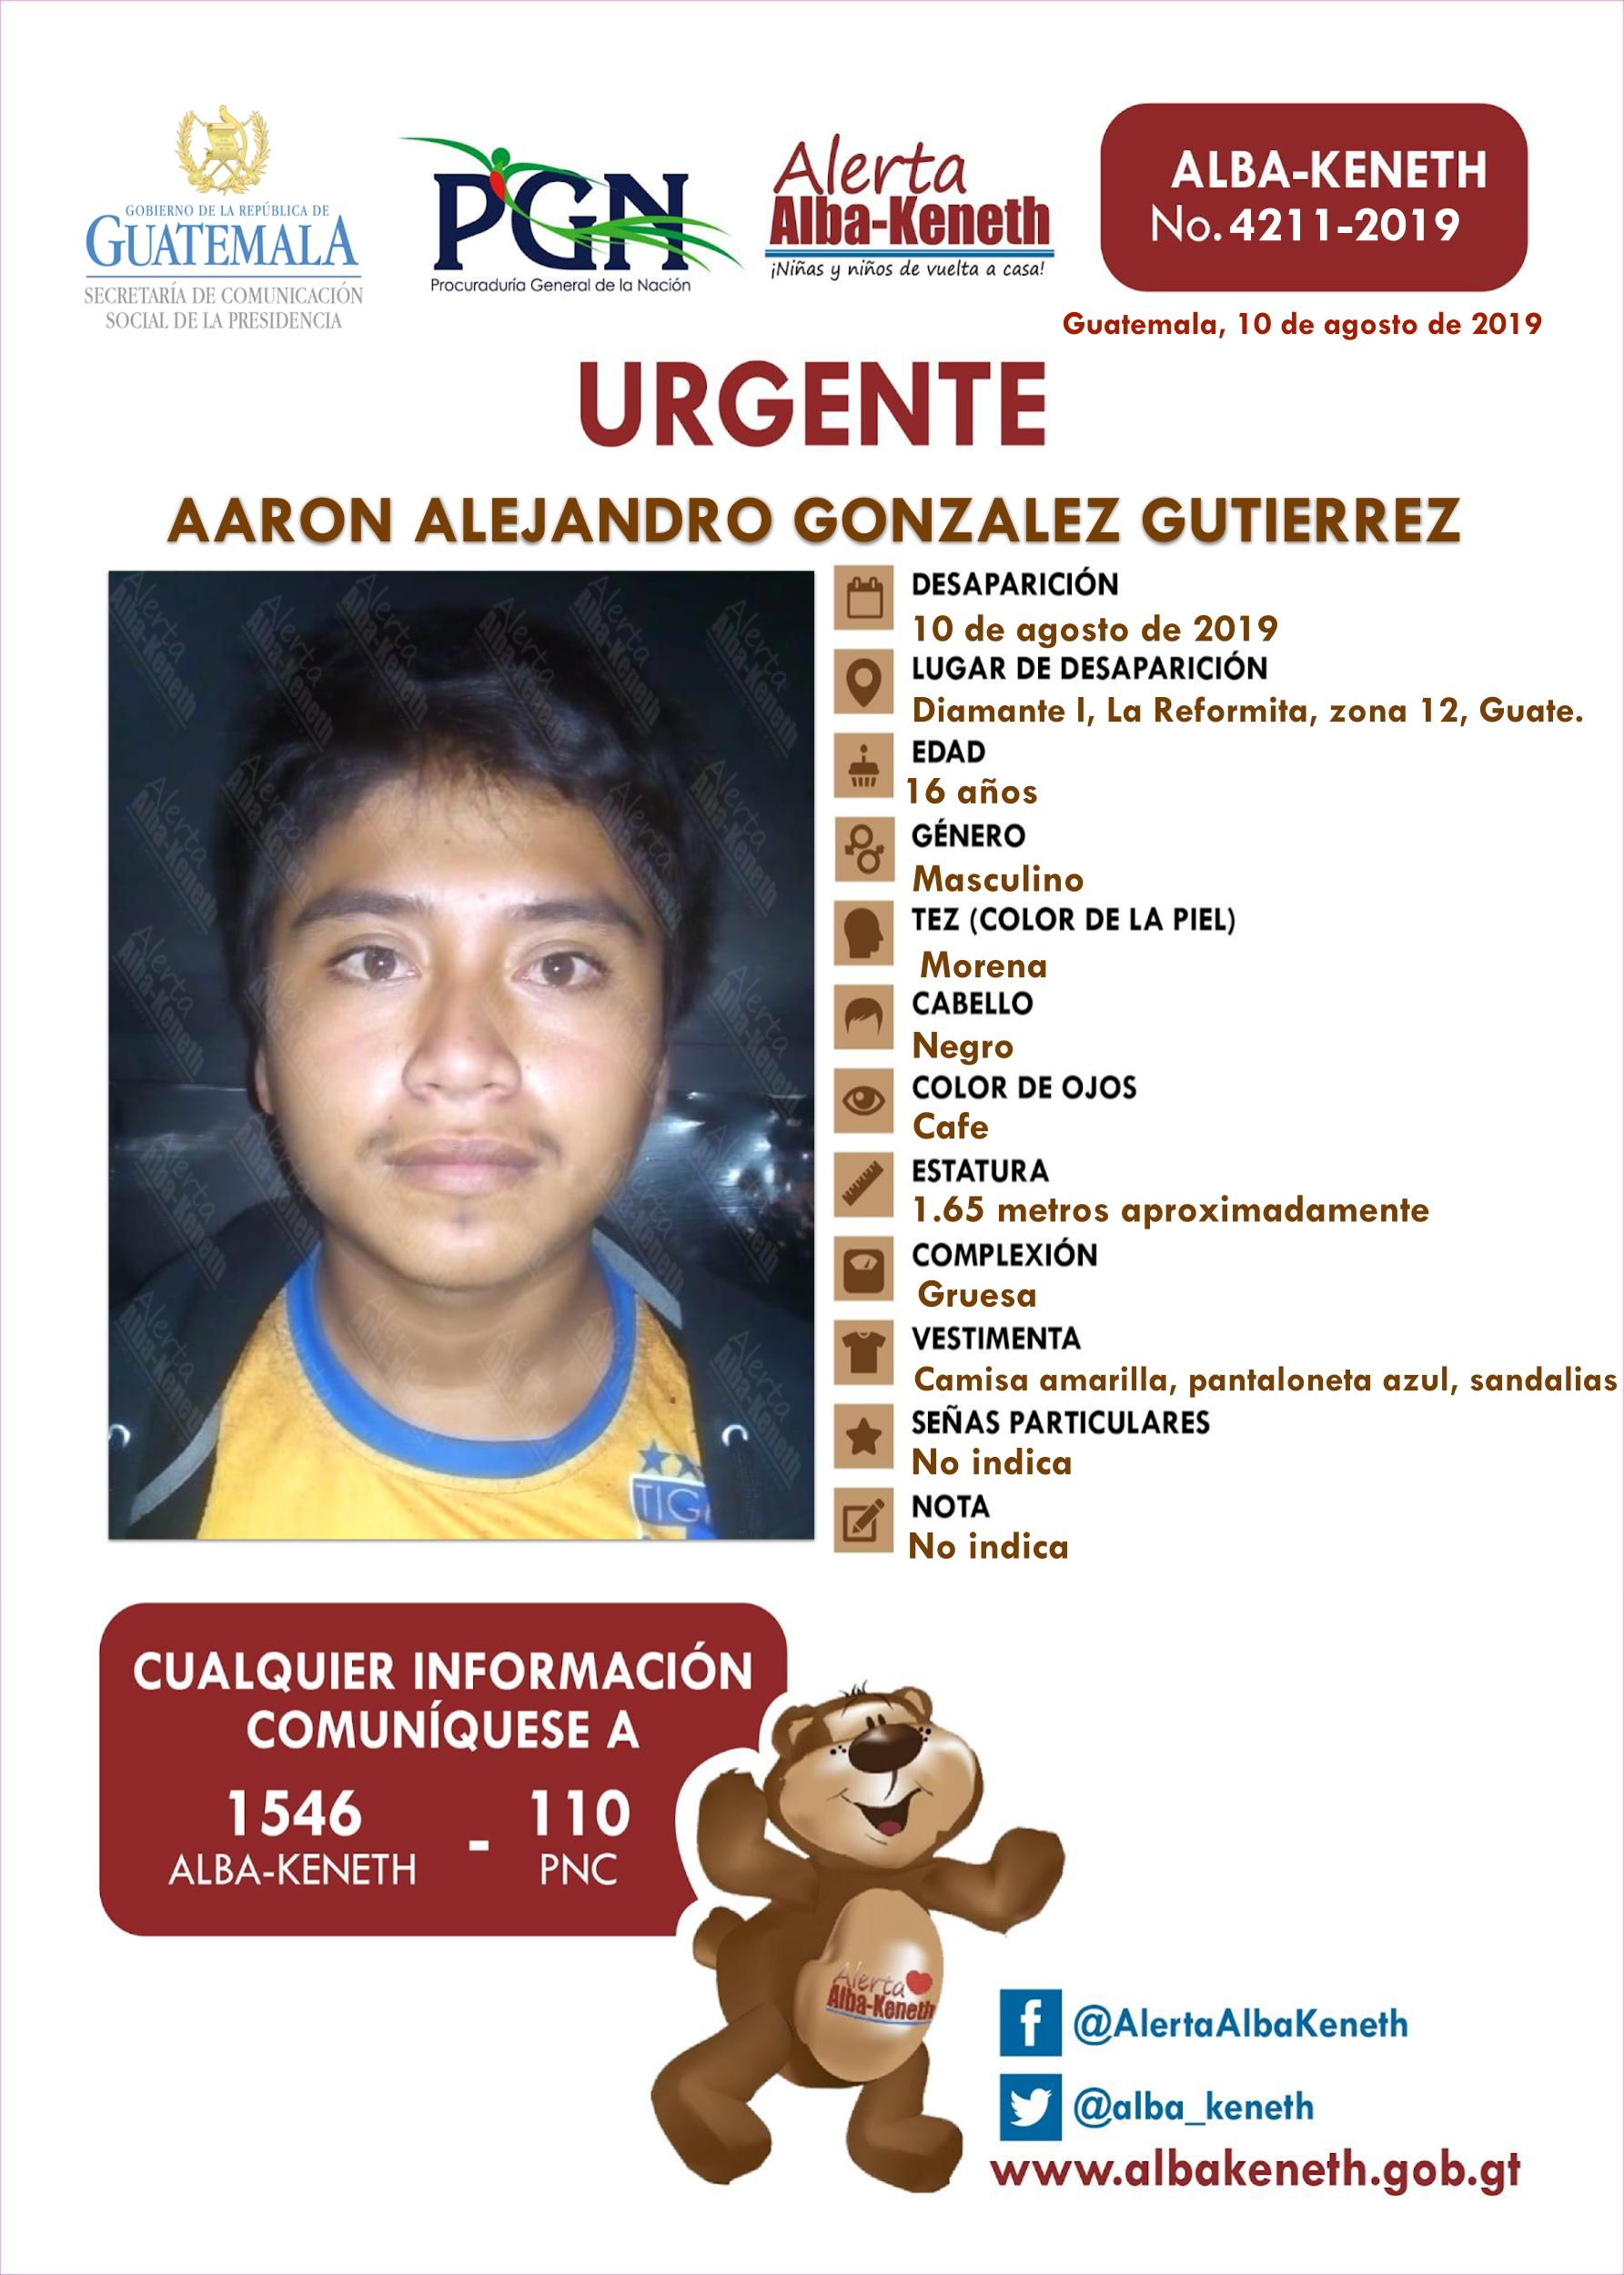 Aaron Alejandro Gonzalez Gutierrez